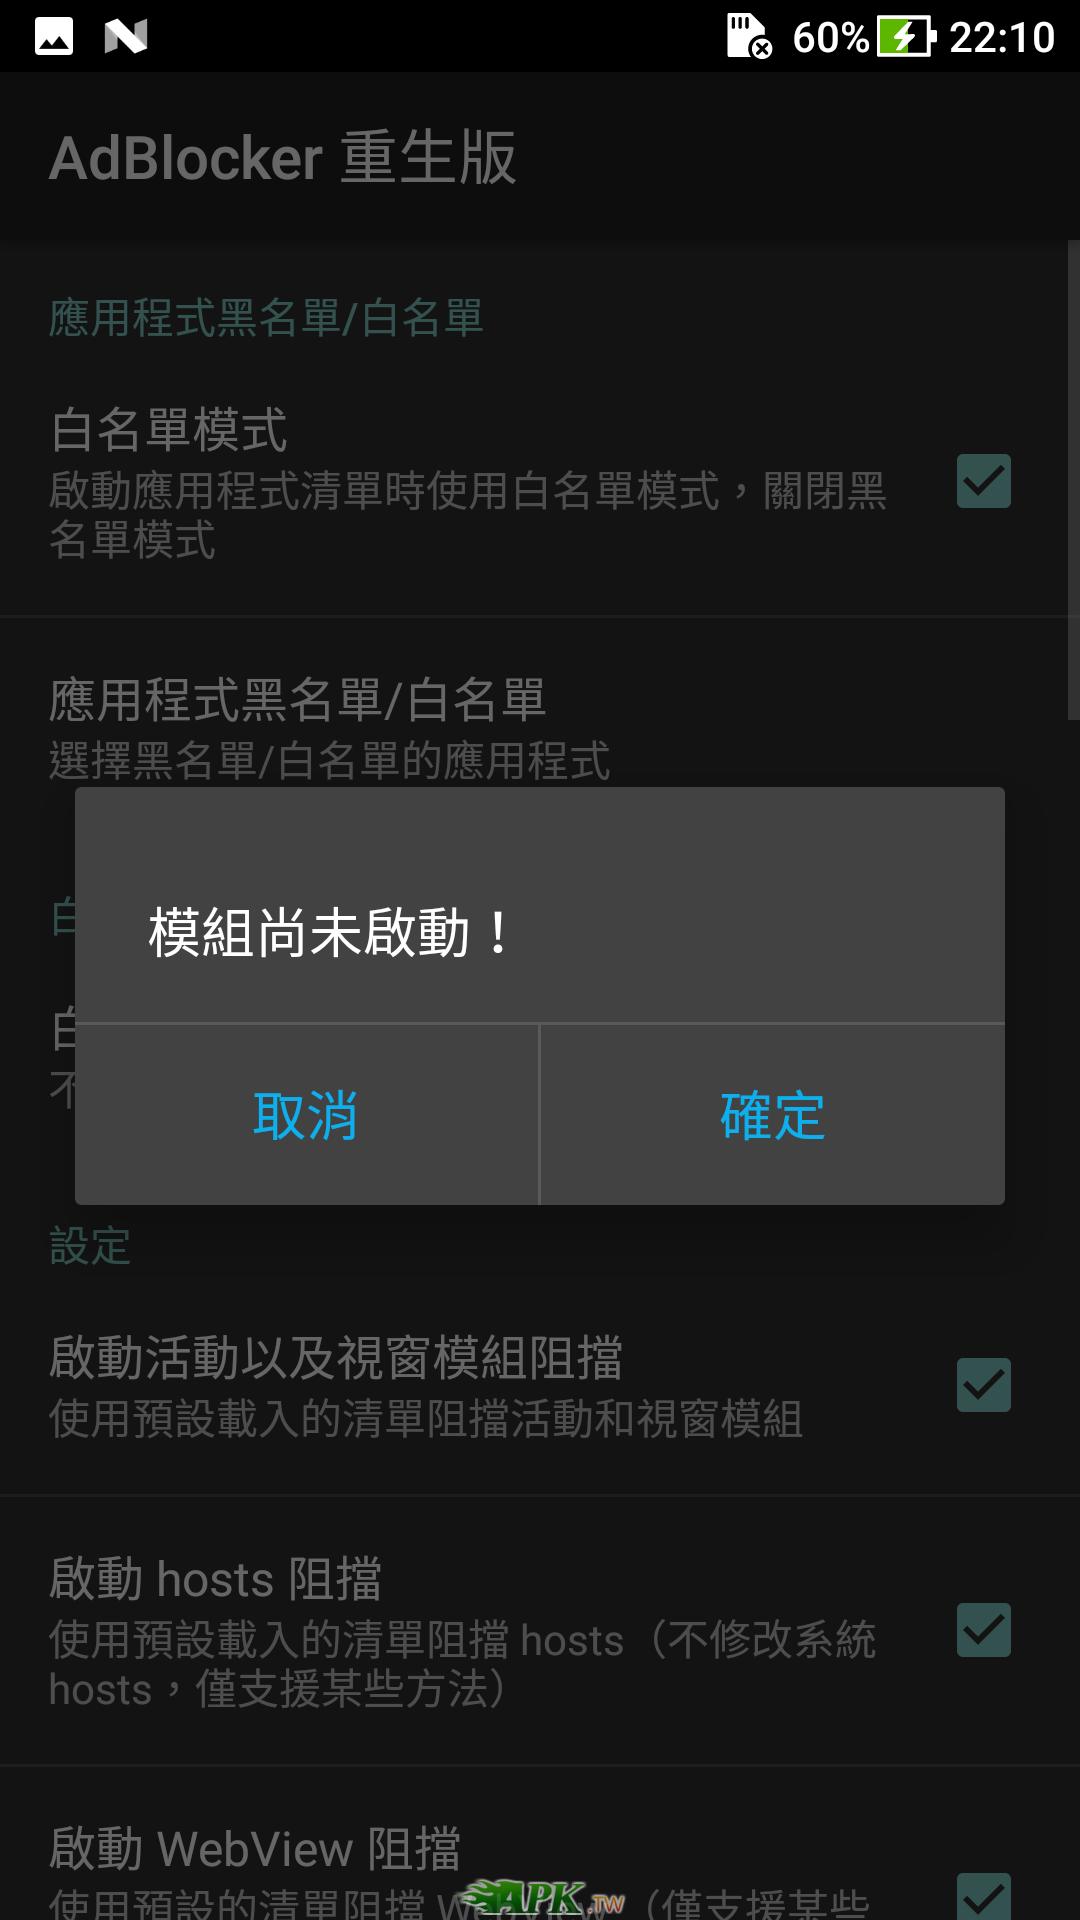 Screenshot_20190307-221057.png